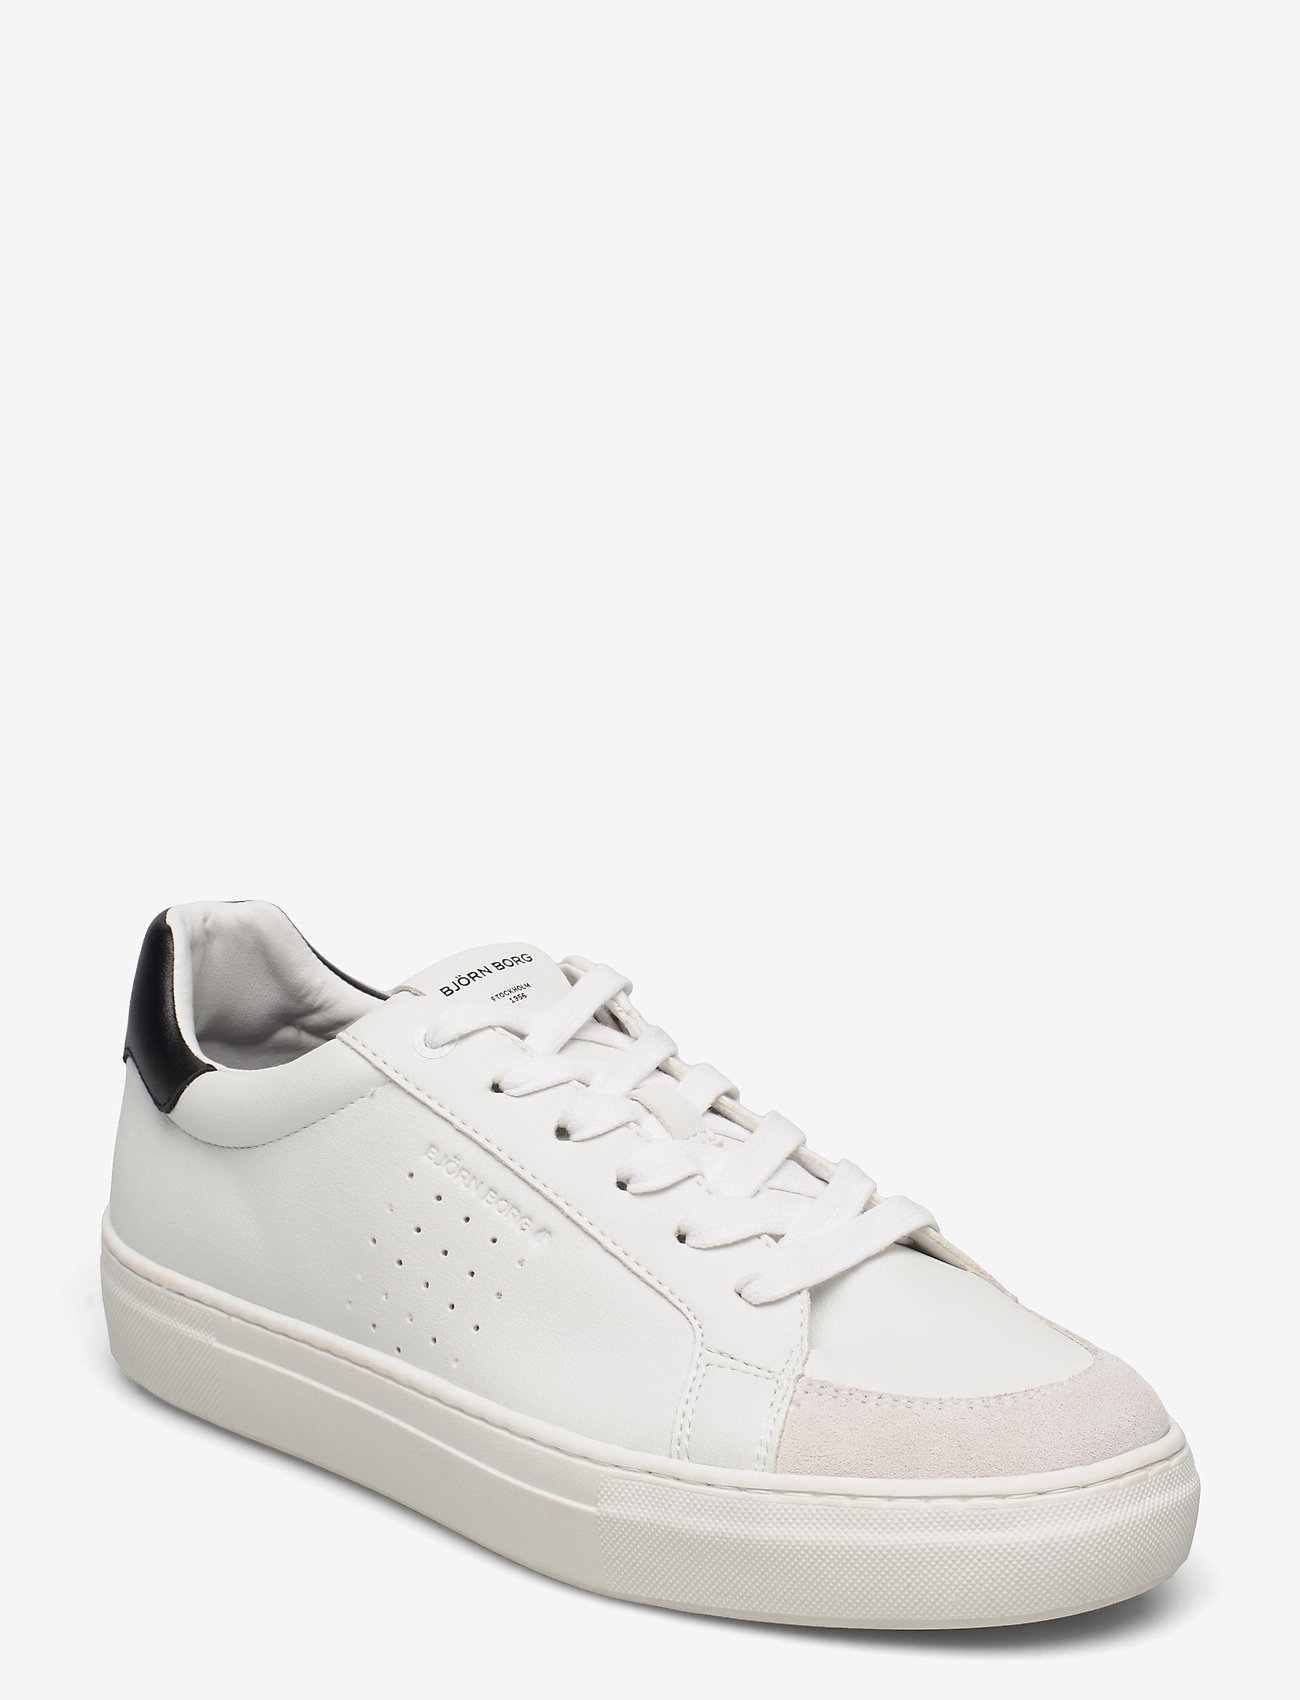 Björn Borg - T1600 BSC M - laag sneakers - white-black - 0